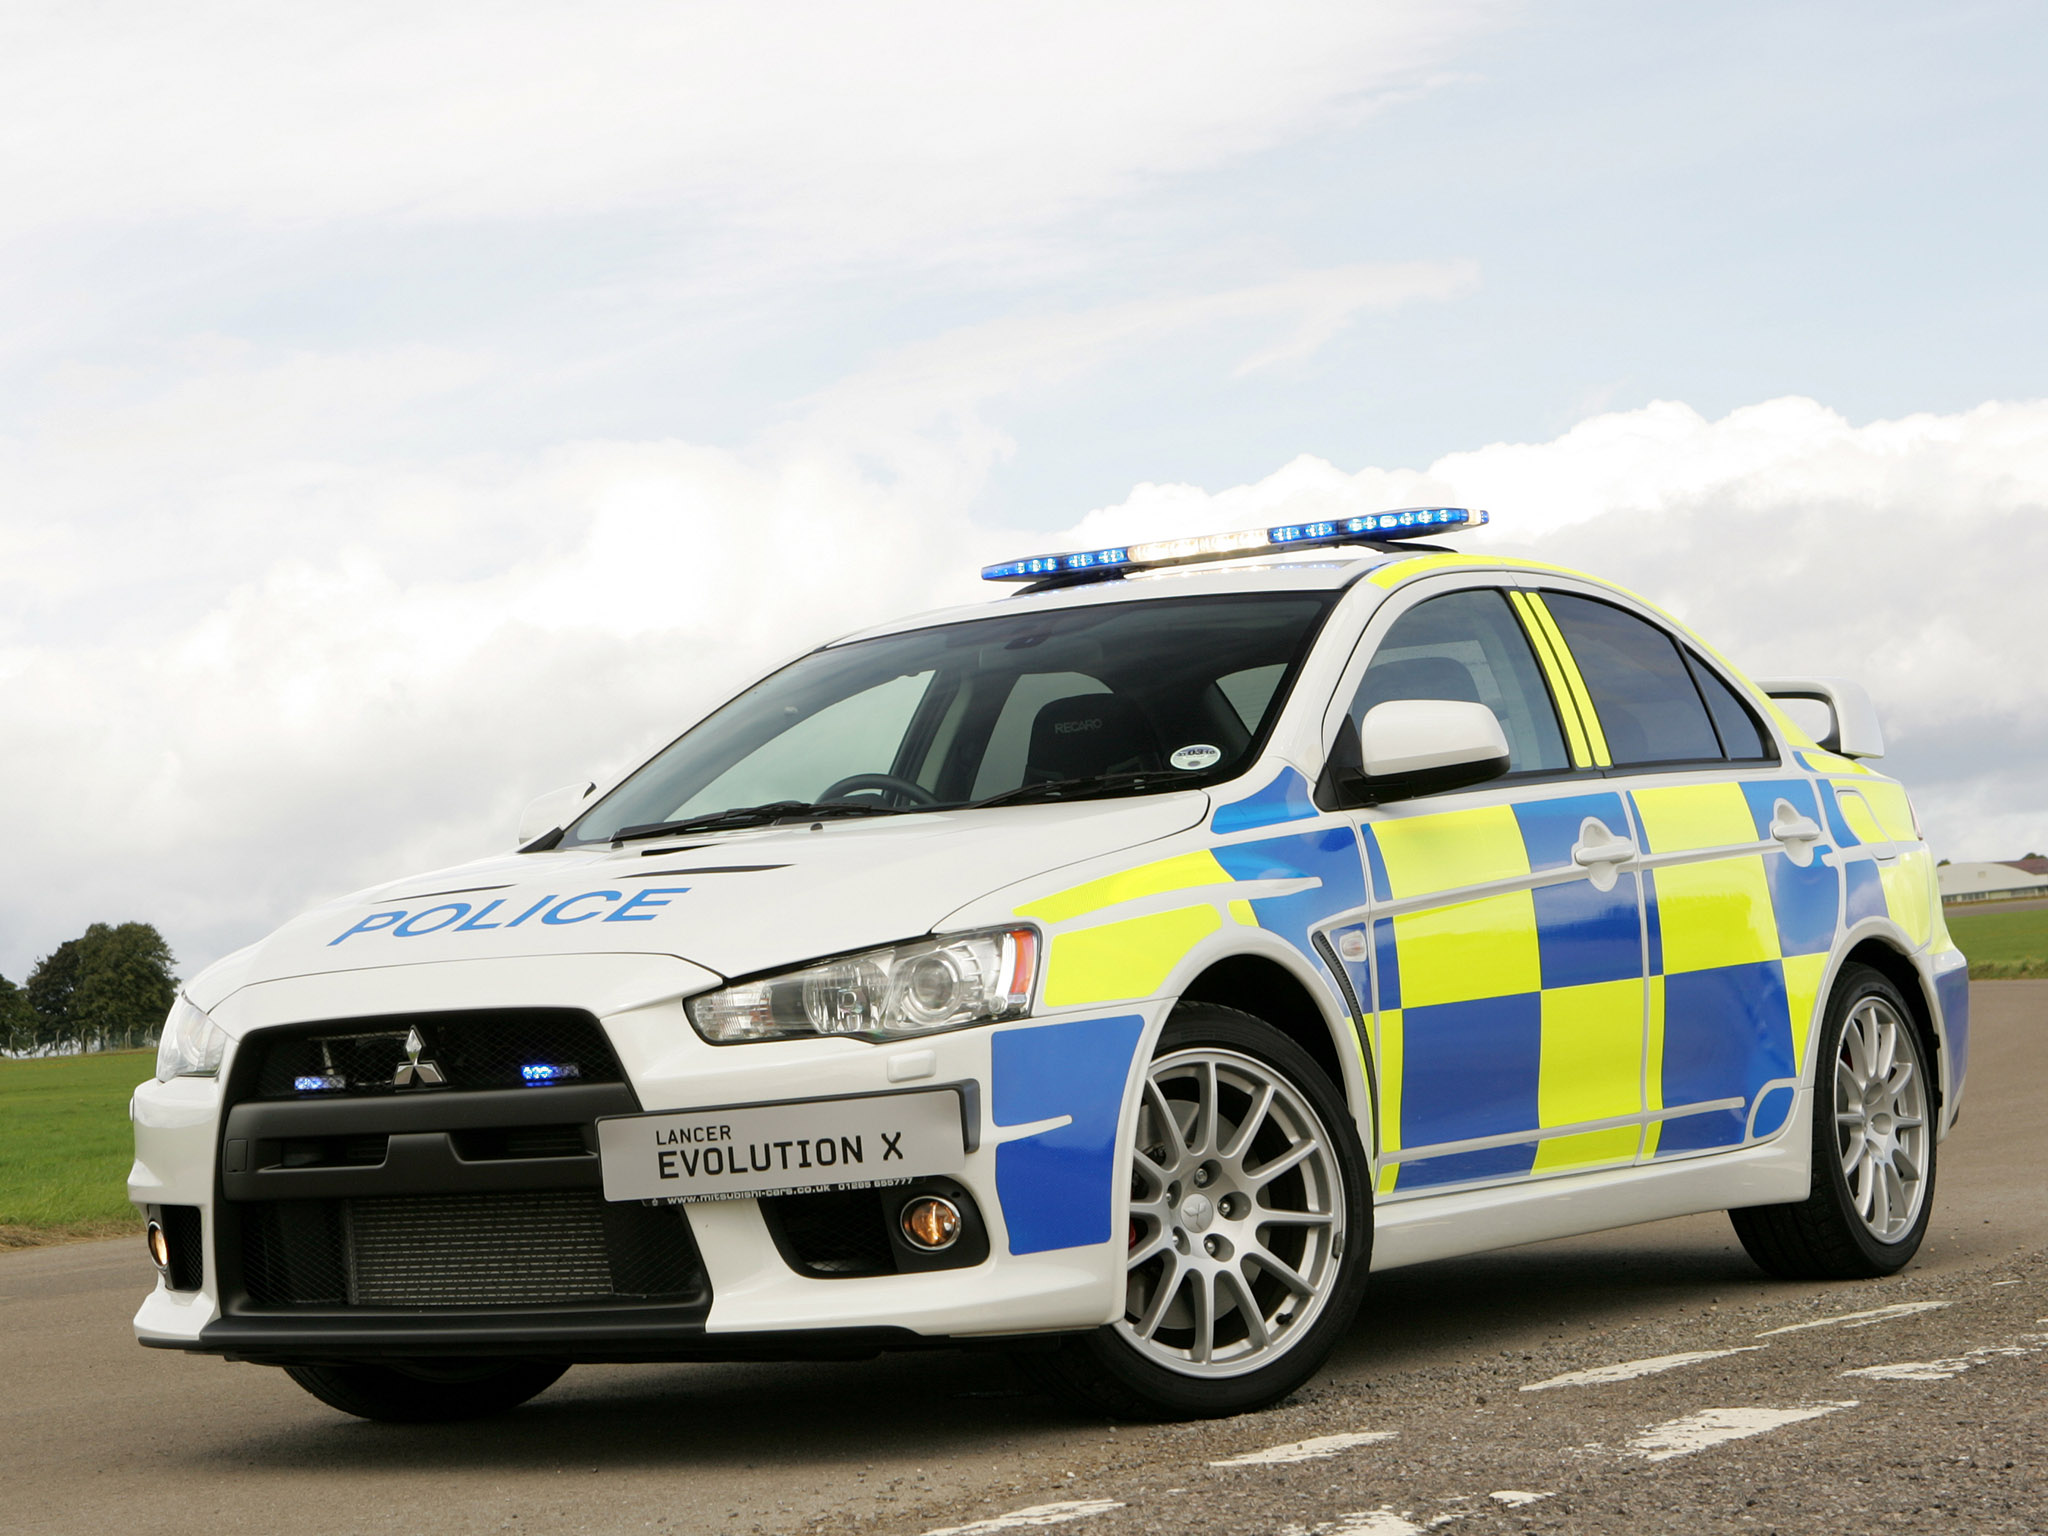 Mitsubishi Lancer Evolution X Police Edition Wallpapers Car Walls 2048x1536